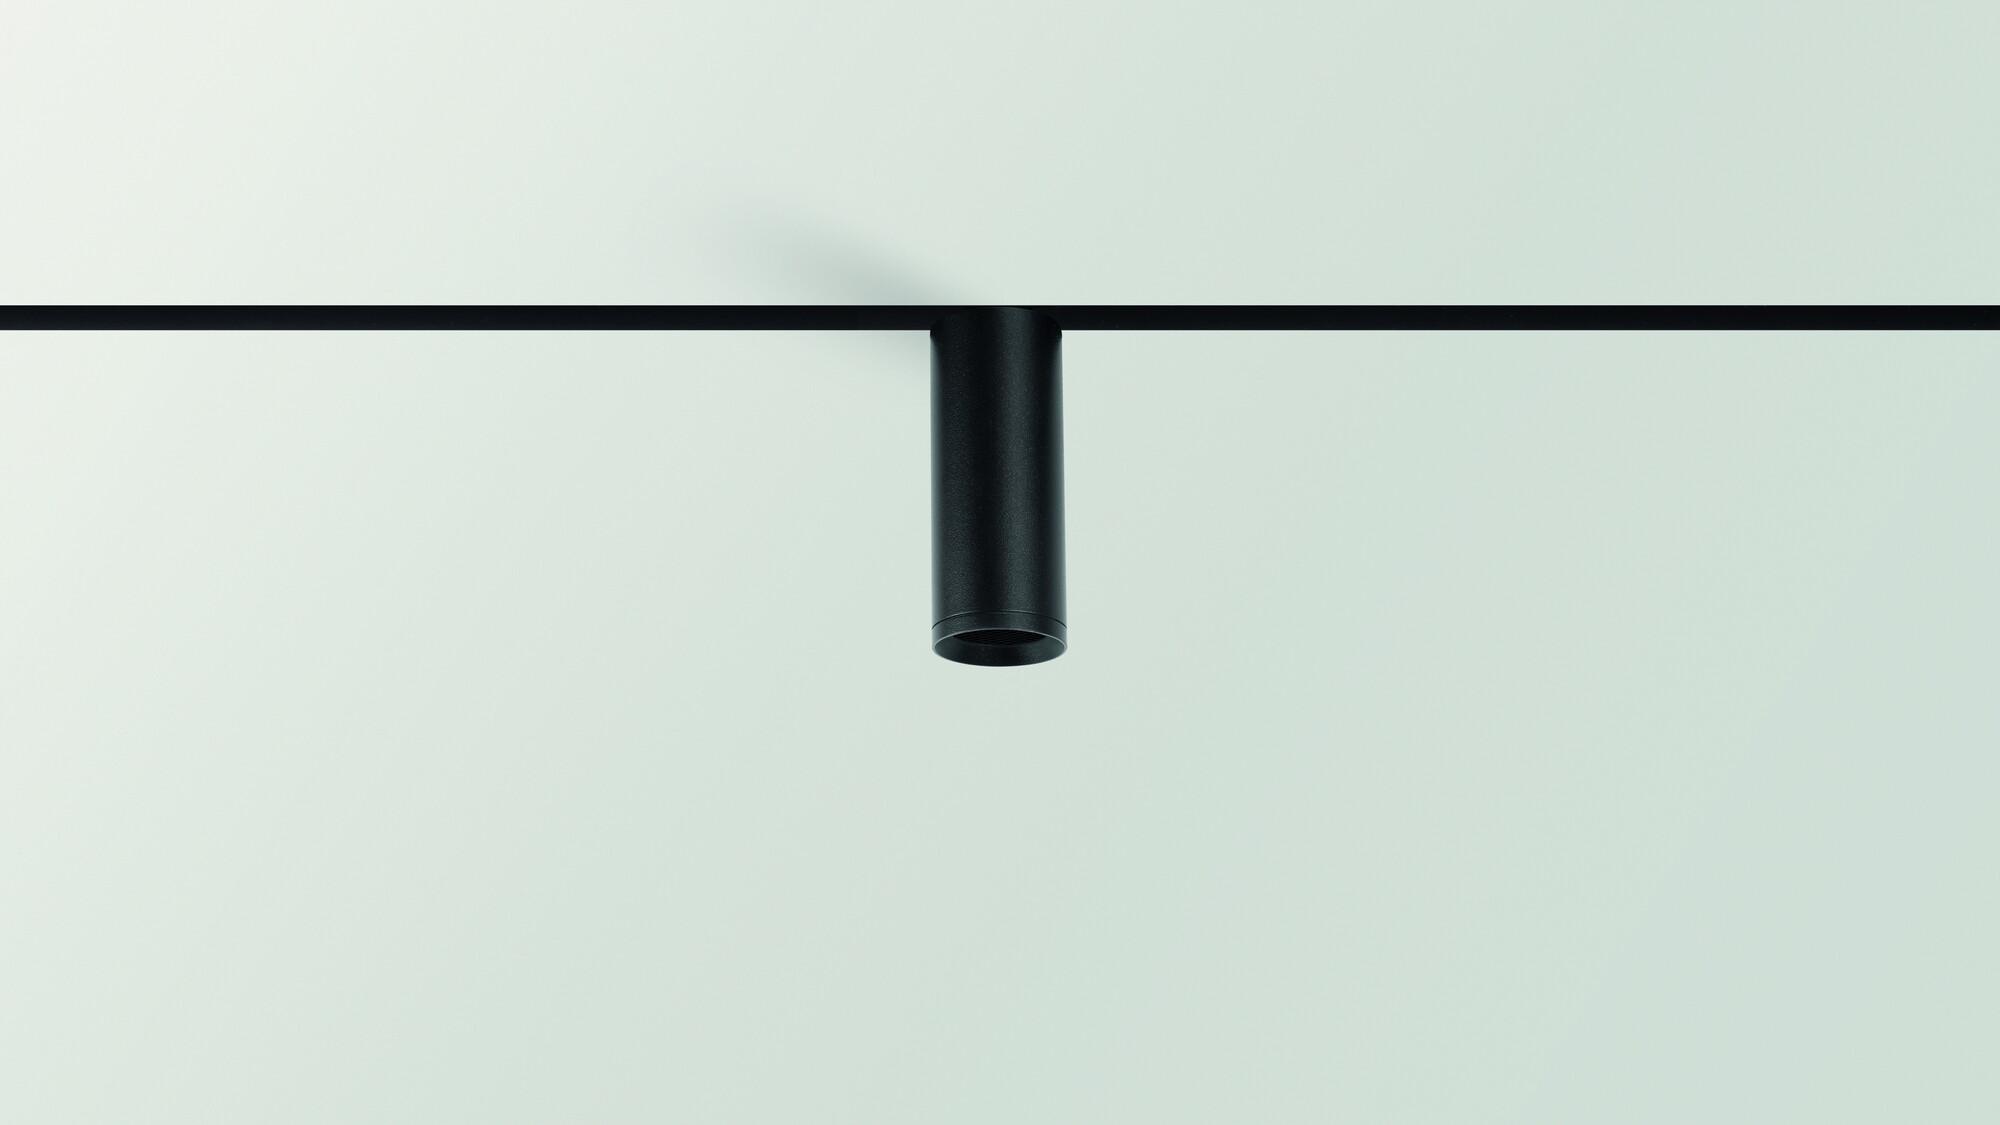 TOP Systeem & profiel LED 1x6,5W/610lm Zwart